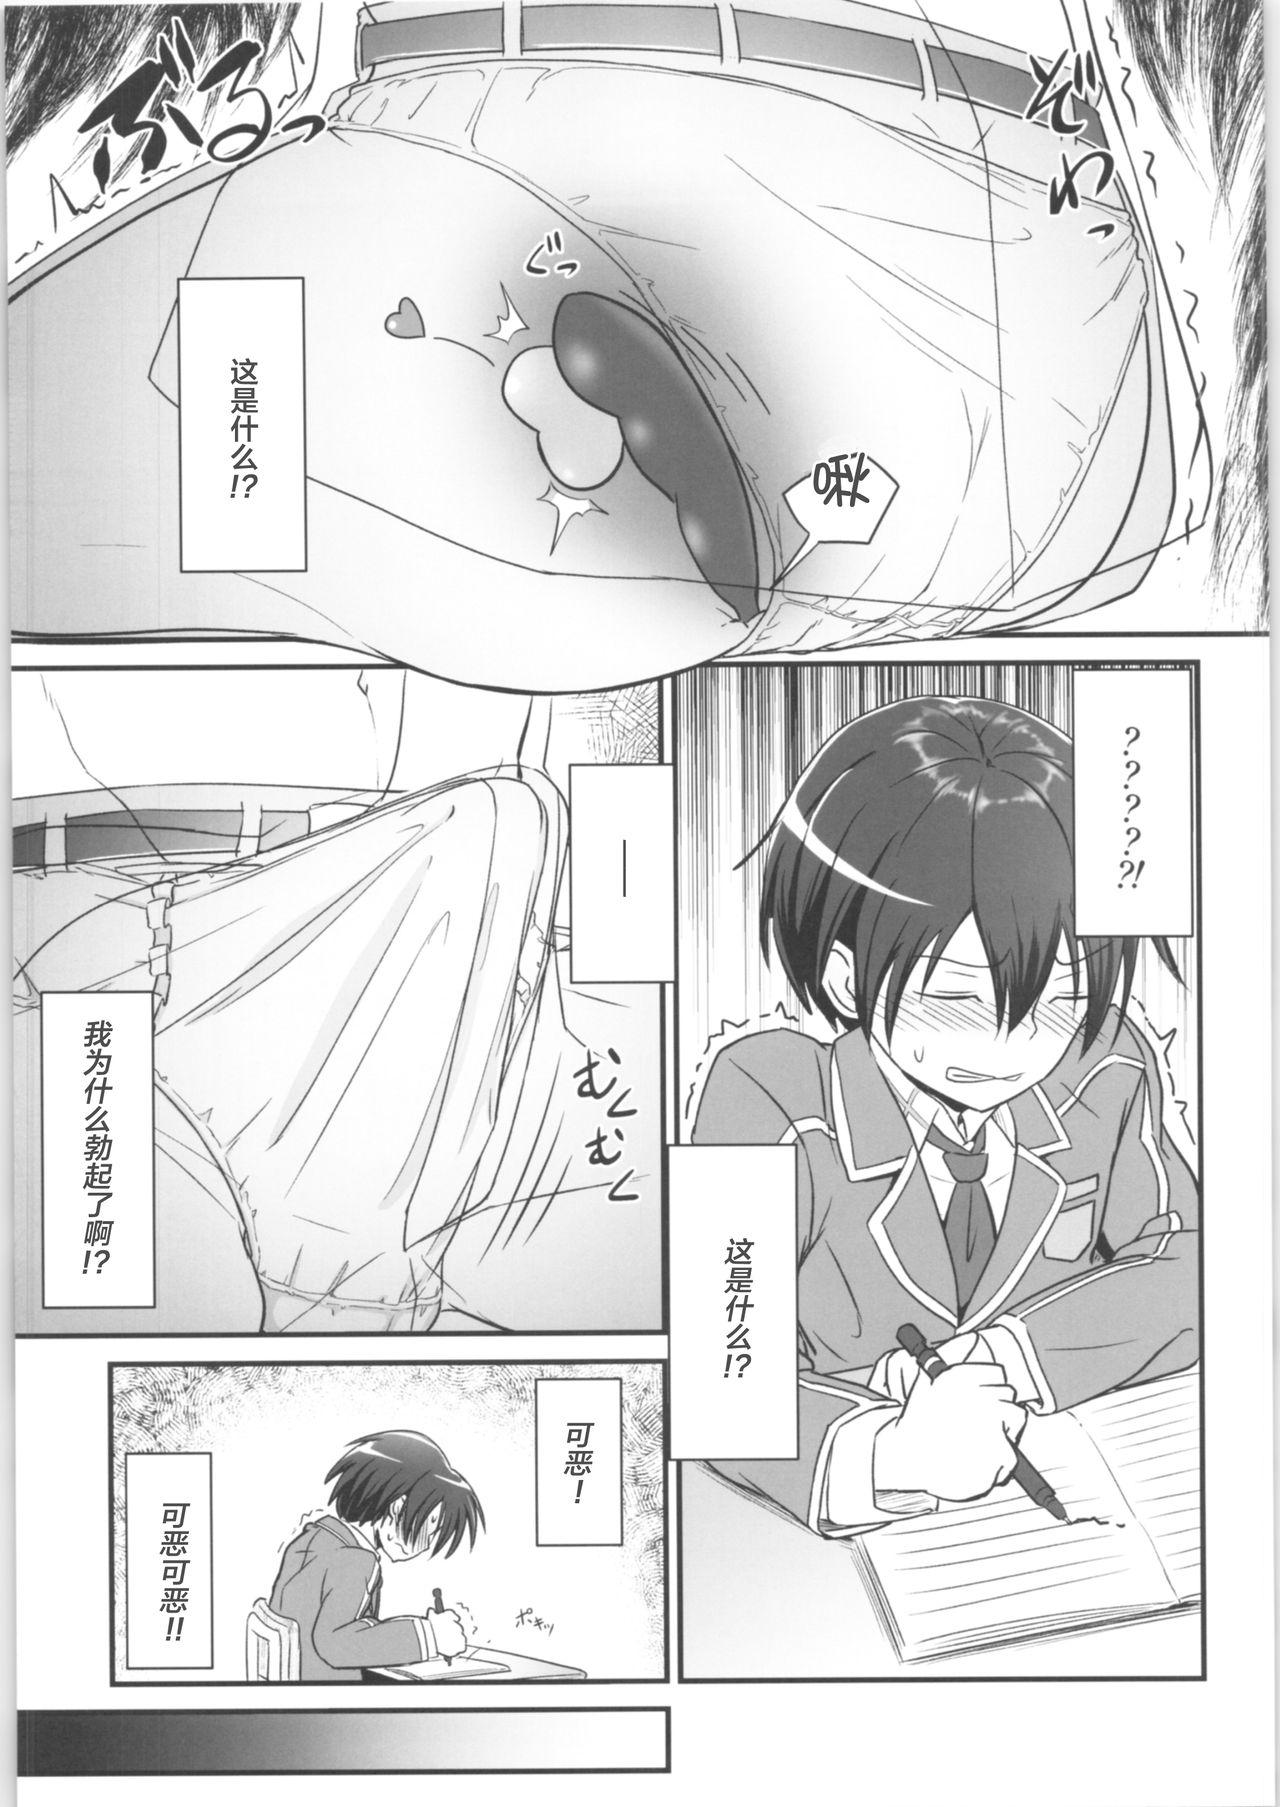 [Umari-ya (D-2)] Kiriko Route Another #02 ~Shitagi Josou Jii Kyouyou Hen~ (Sword Art Online)[Chinese]【不可视汉化】 6